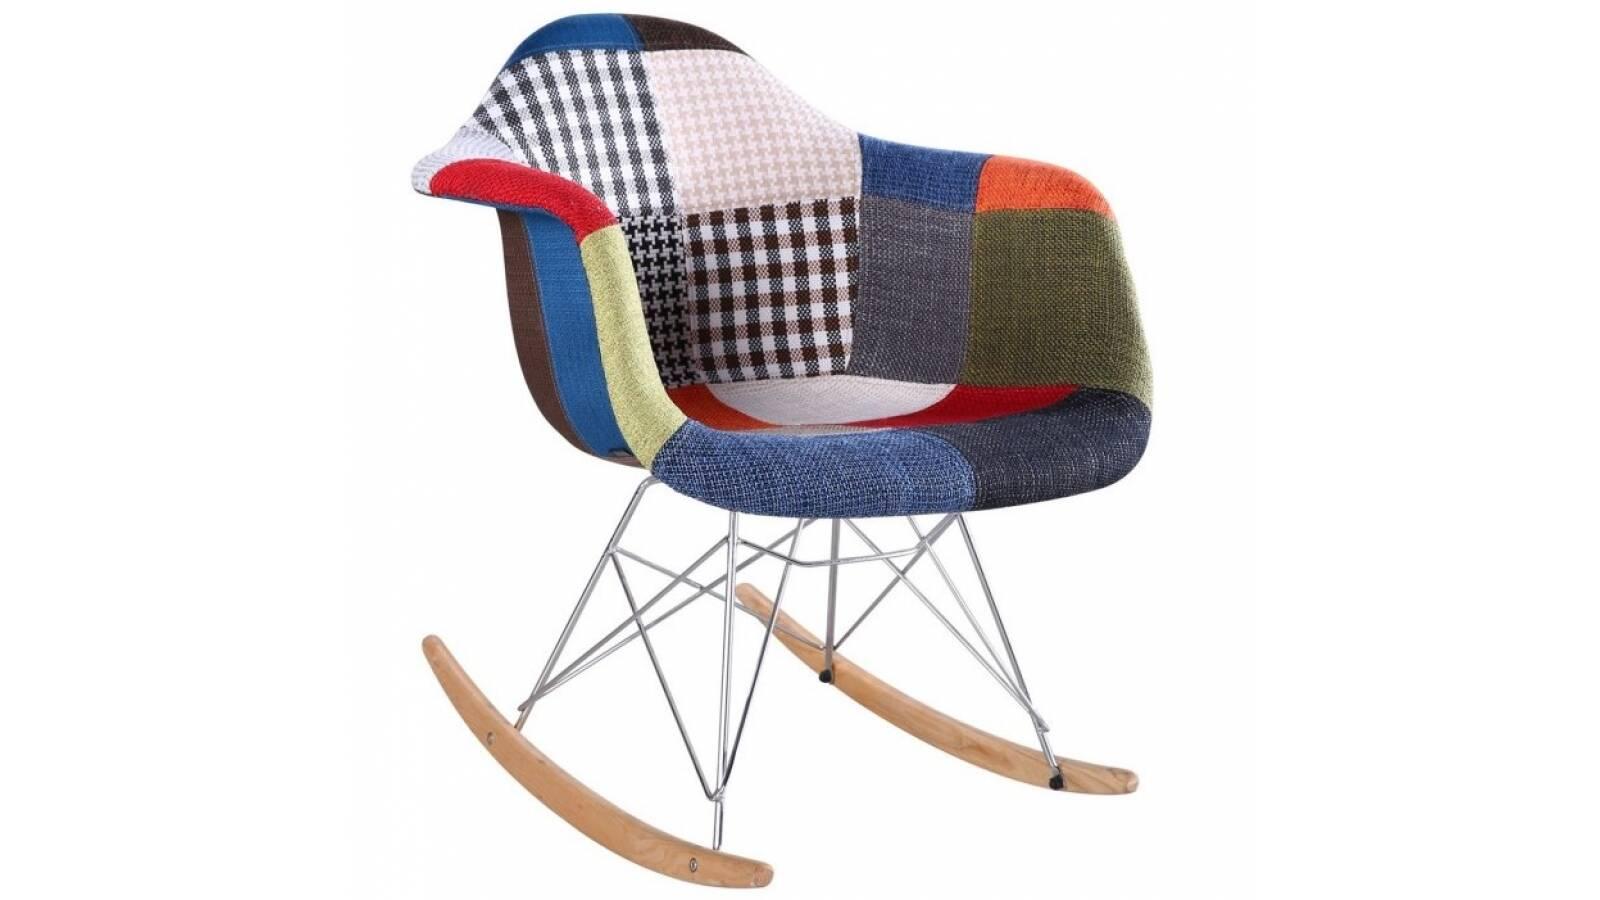 Silla mecedora Patchwork Eames